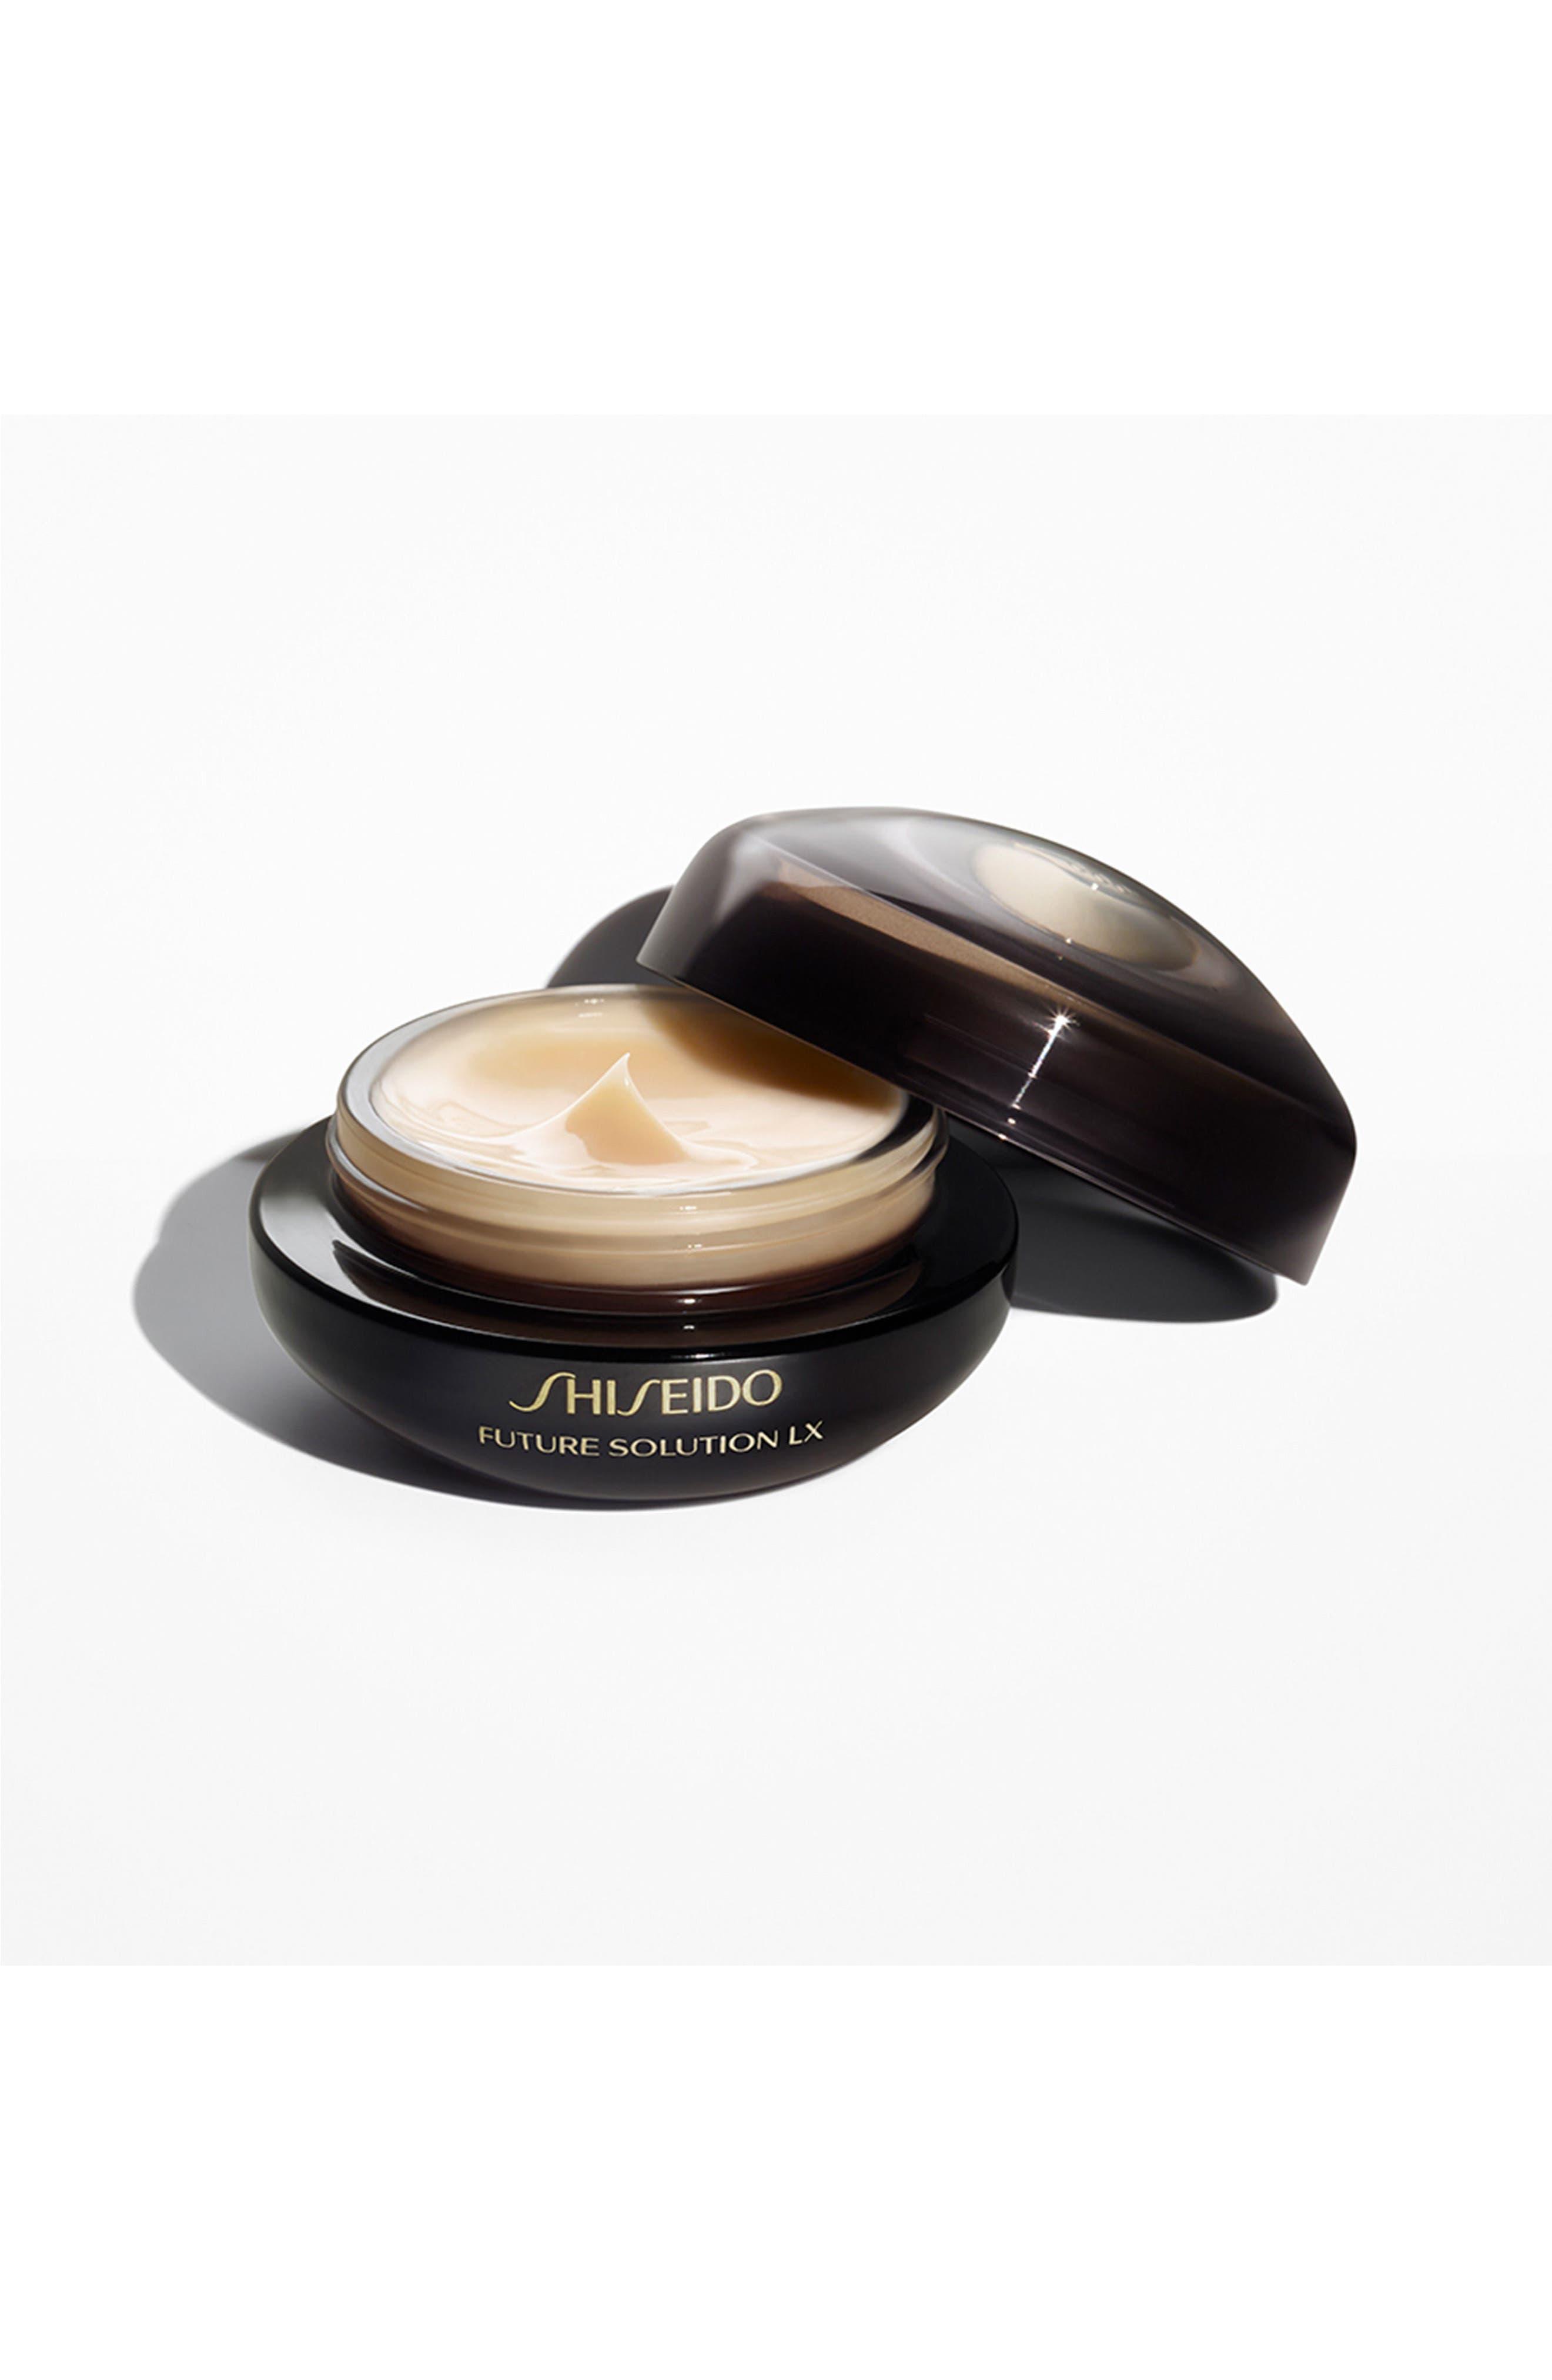 Future Solution LX Eye & Lip Contour Regenerating Cream,                             Alternate thumbnail 2, color,                             NO COLOR